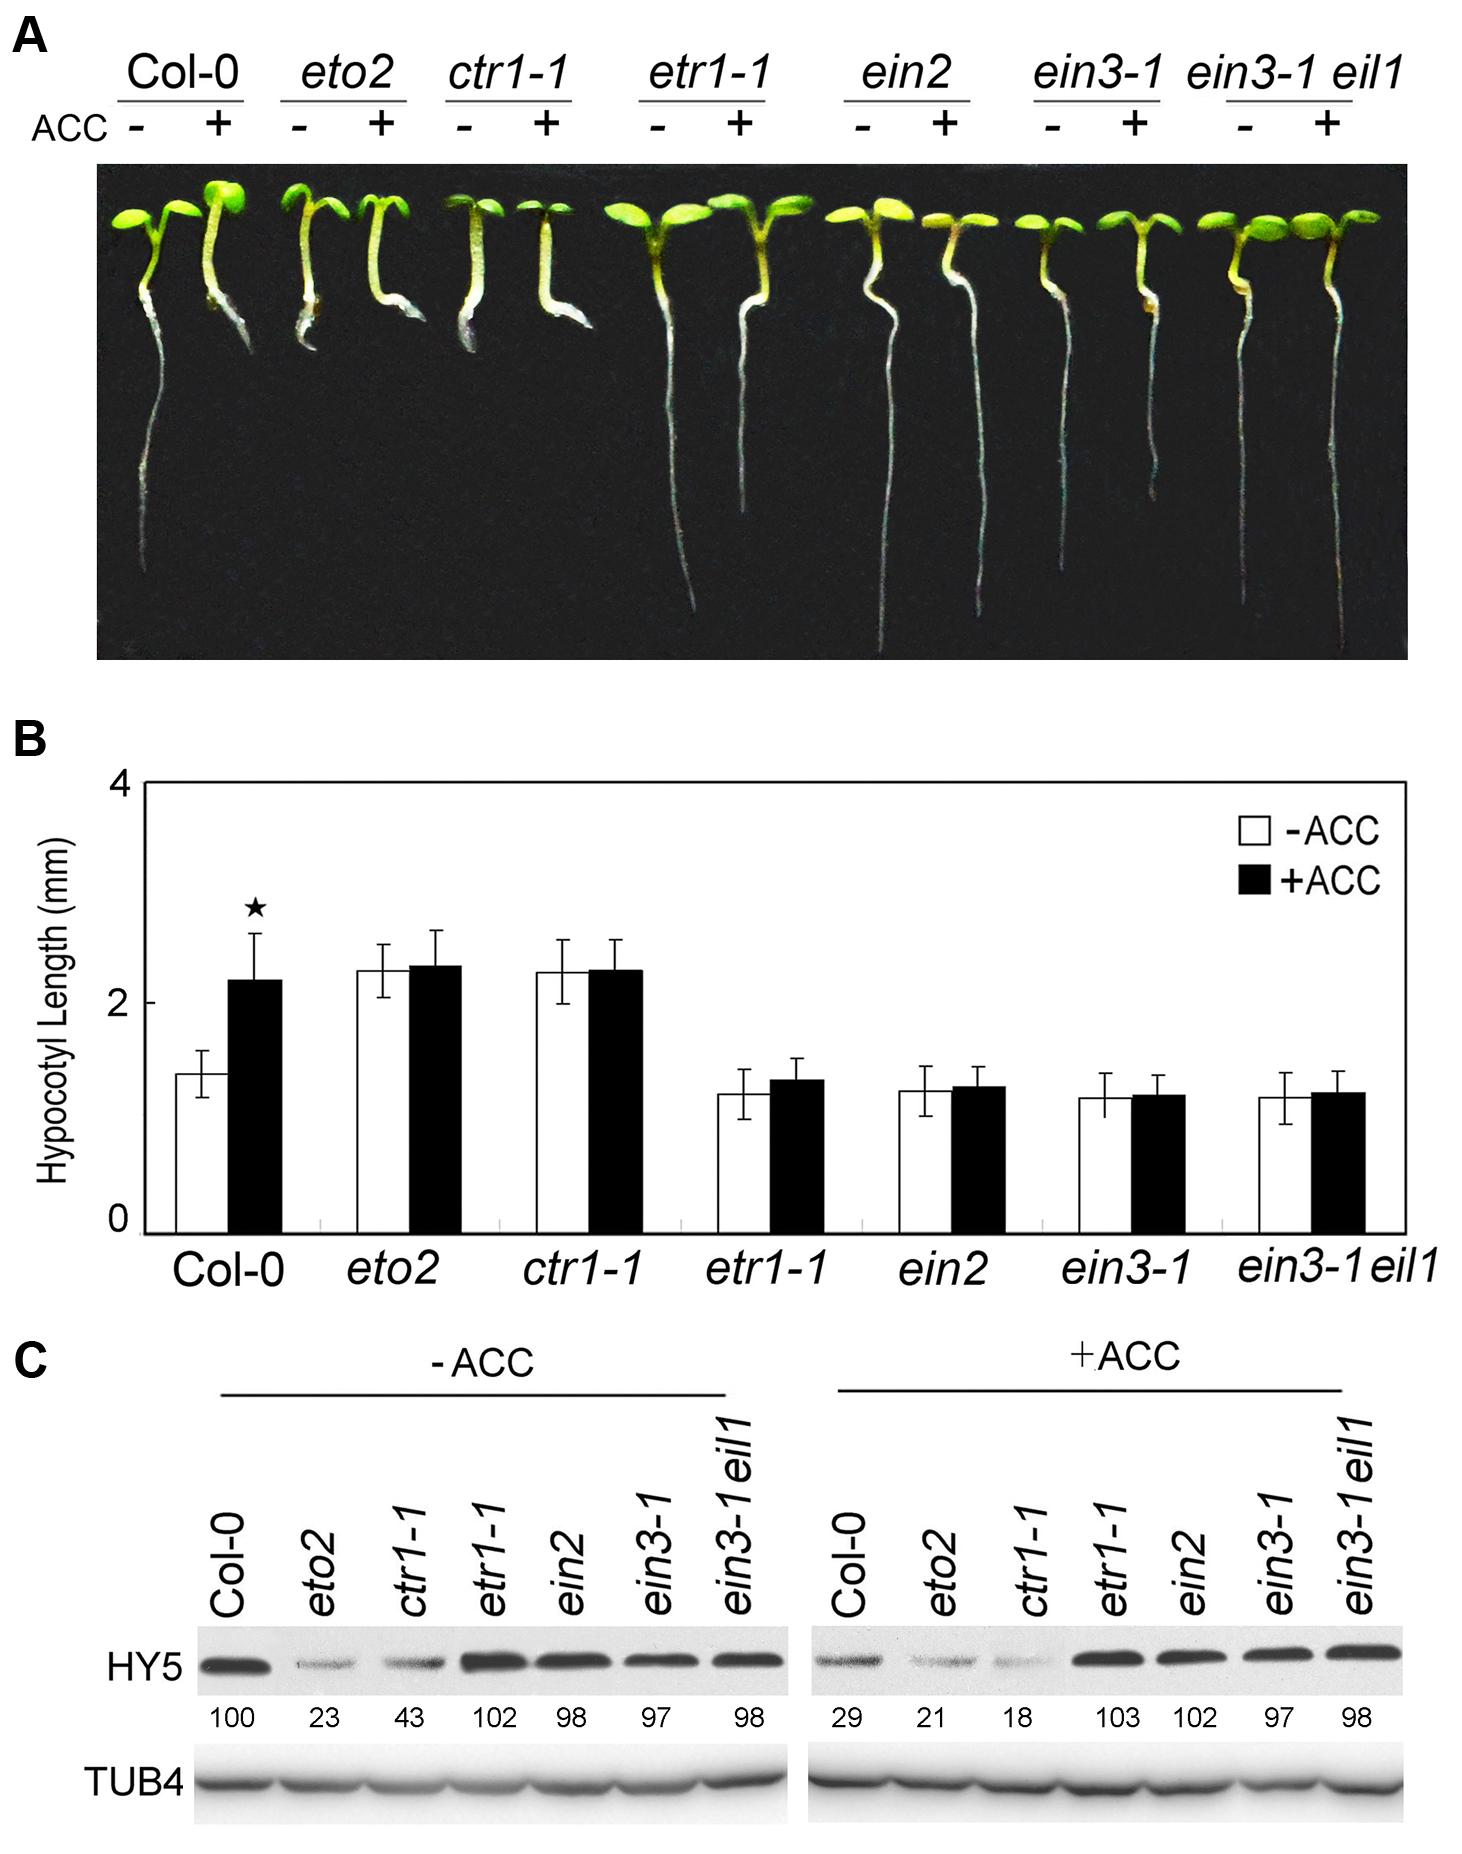 Ethylene signalling positively promotes hypocotyl growth and HY5 degradation.